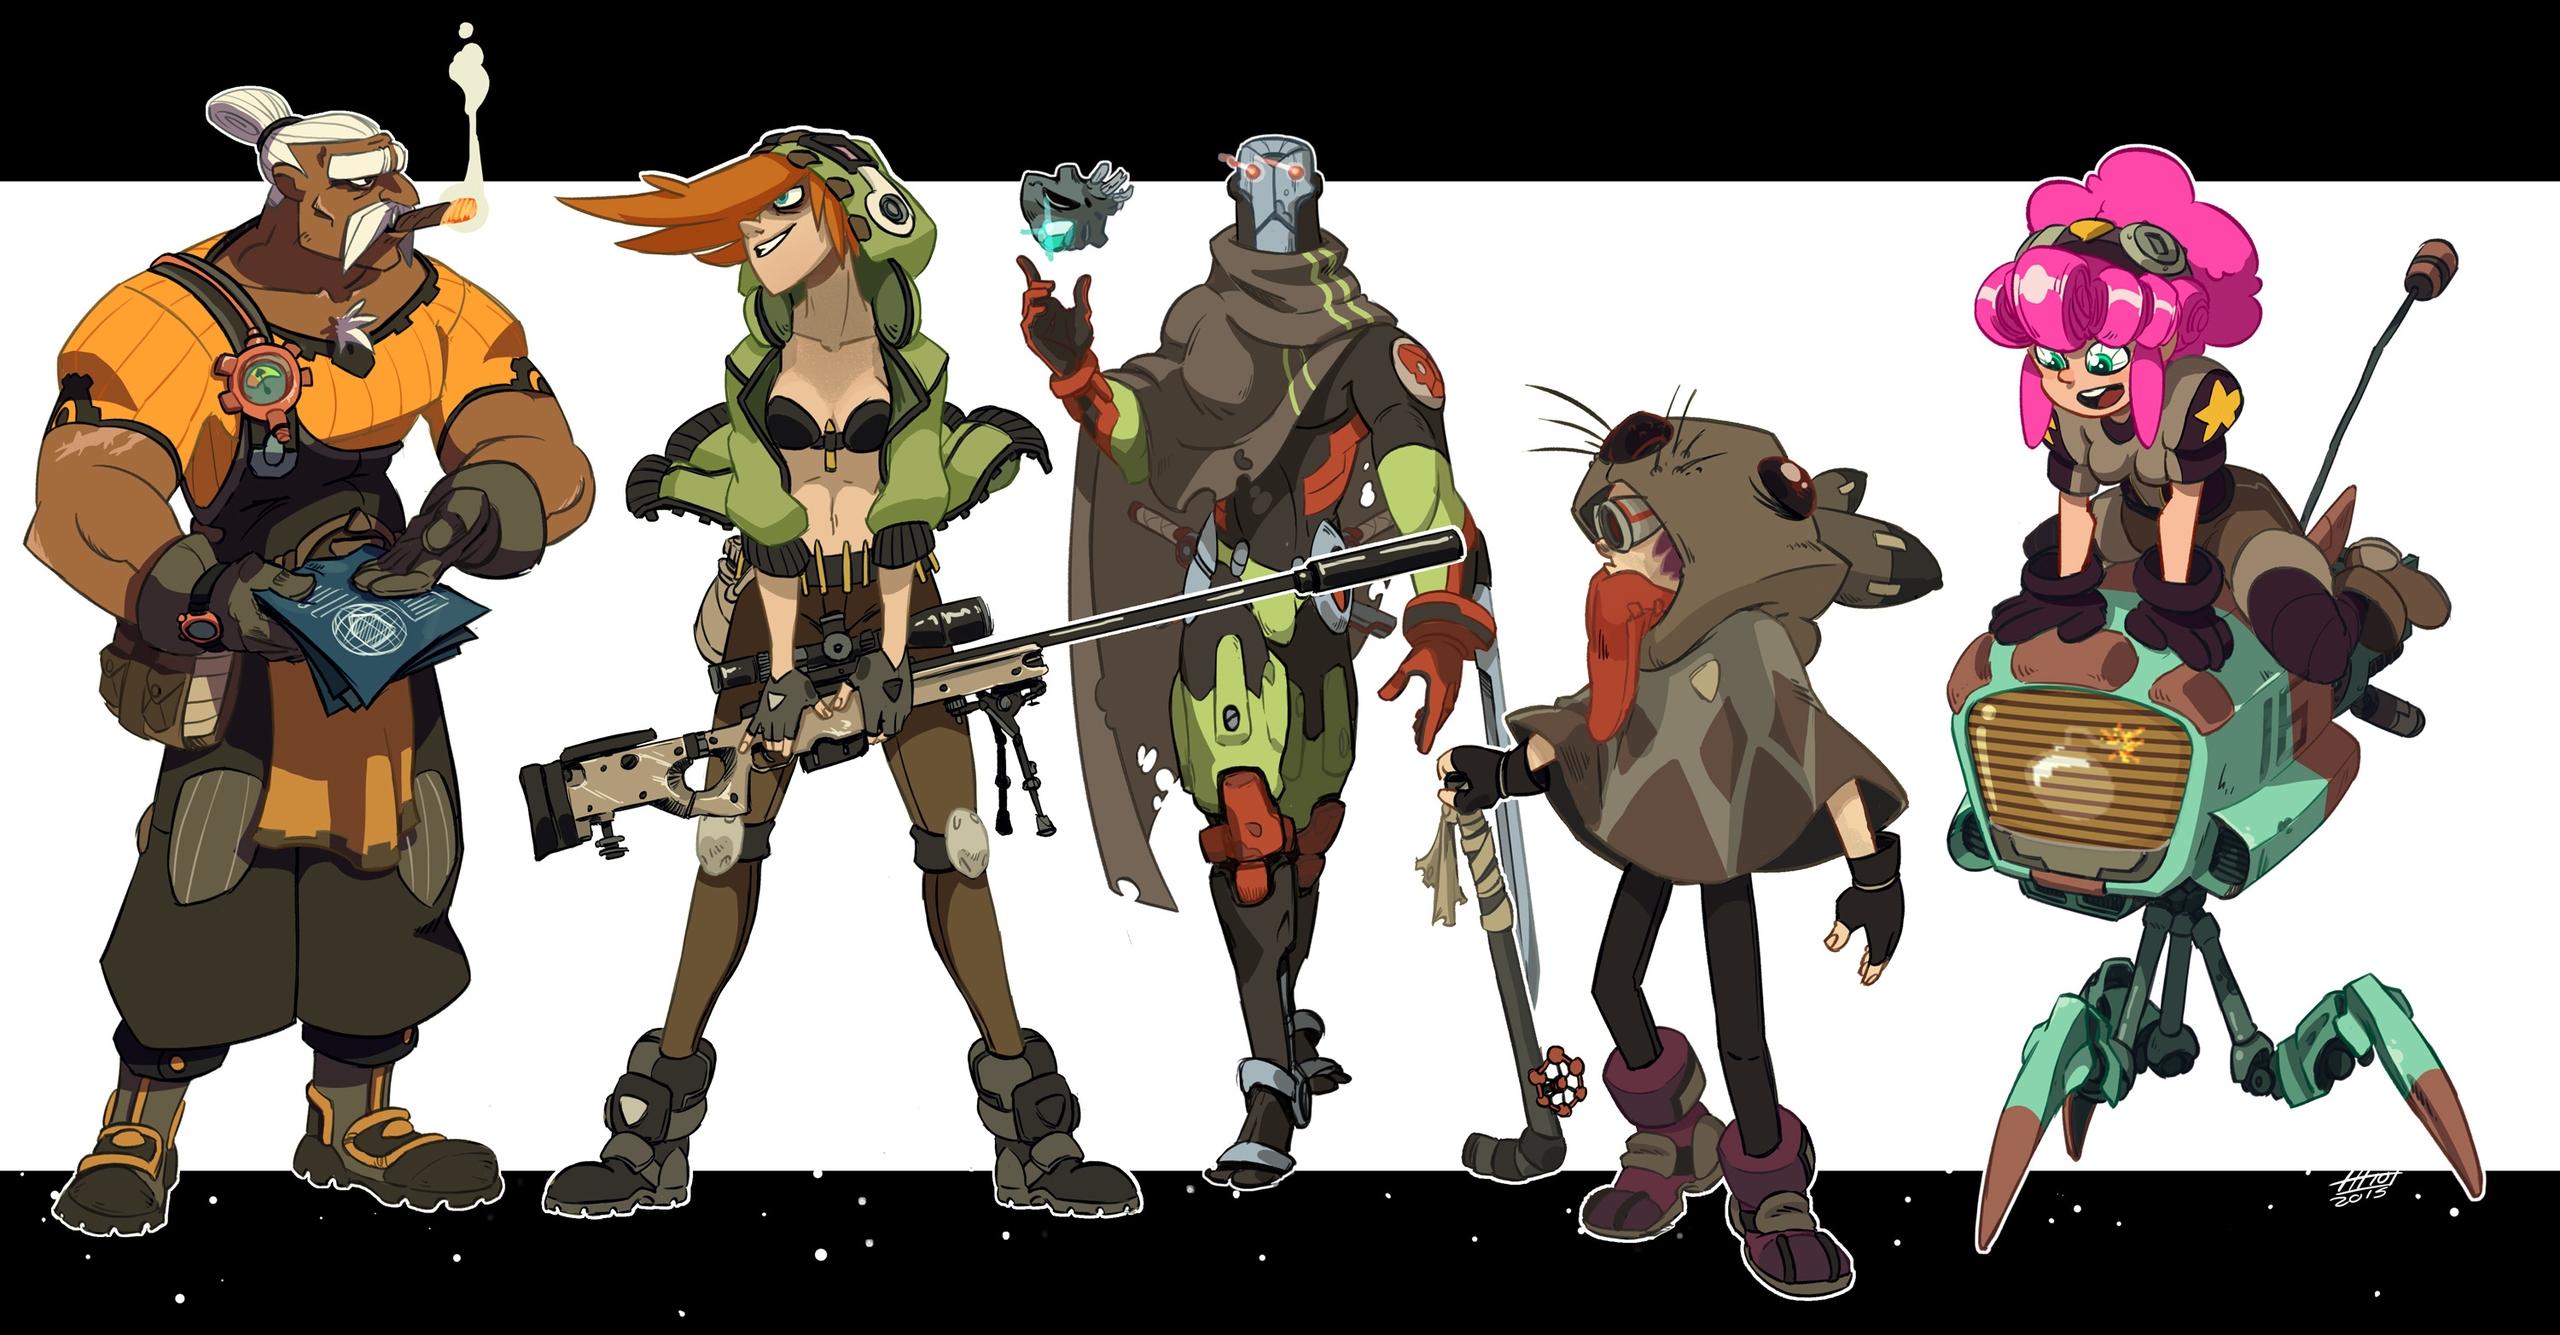 Desert world adventure team - characterdesign - emanuelearnaldi | ello